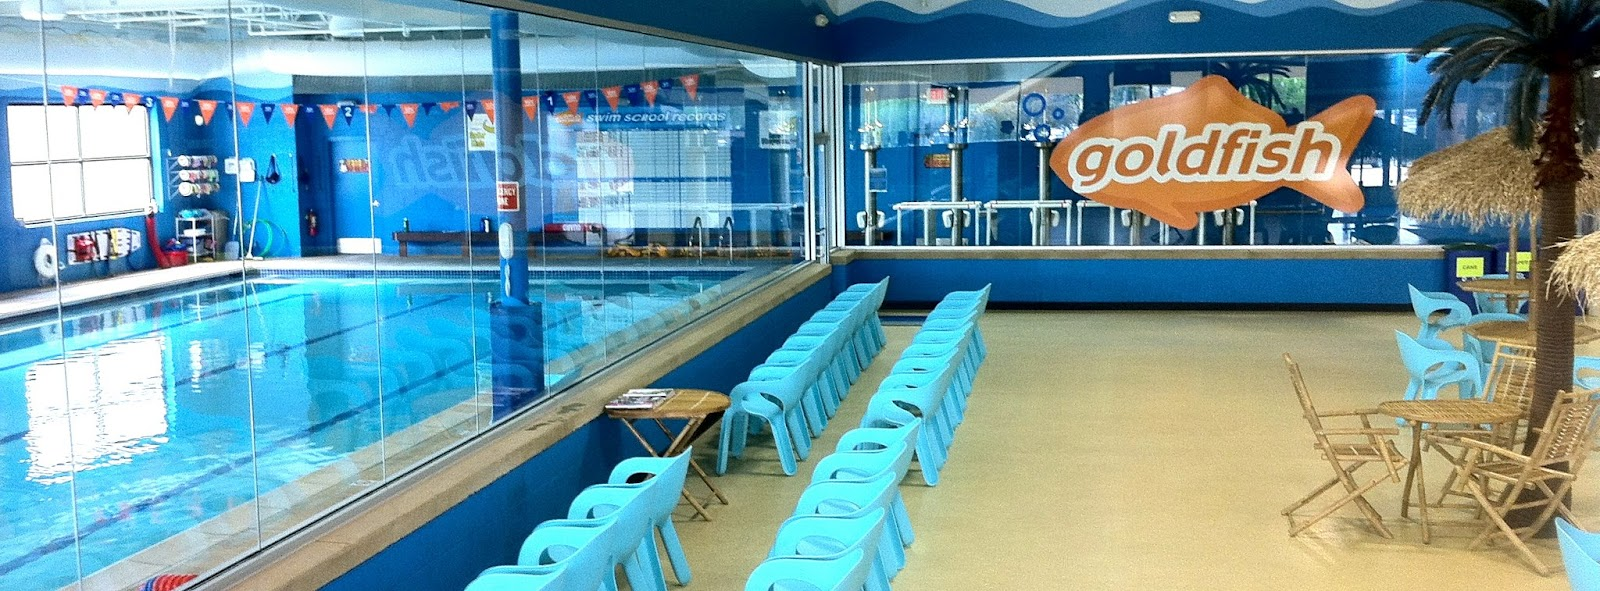 Swimming Lessons in Ann Arbor | Swim School for Kids